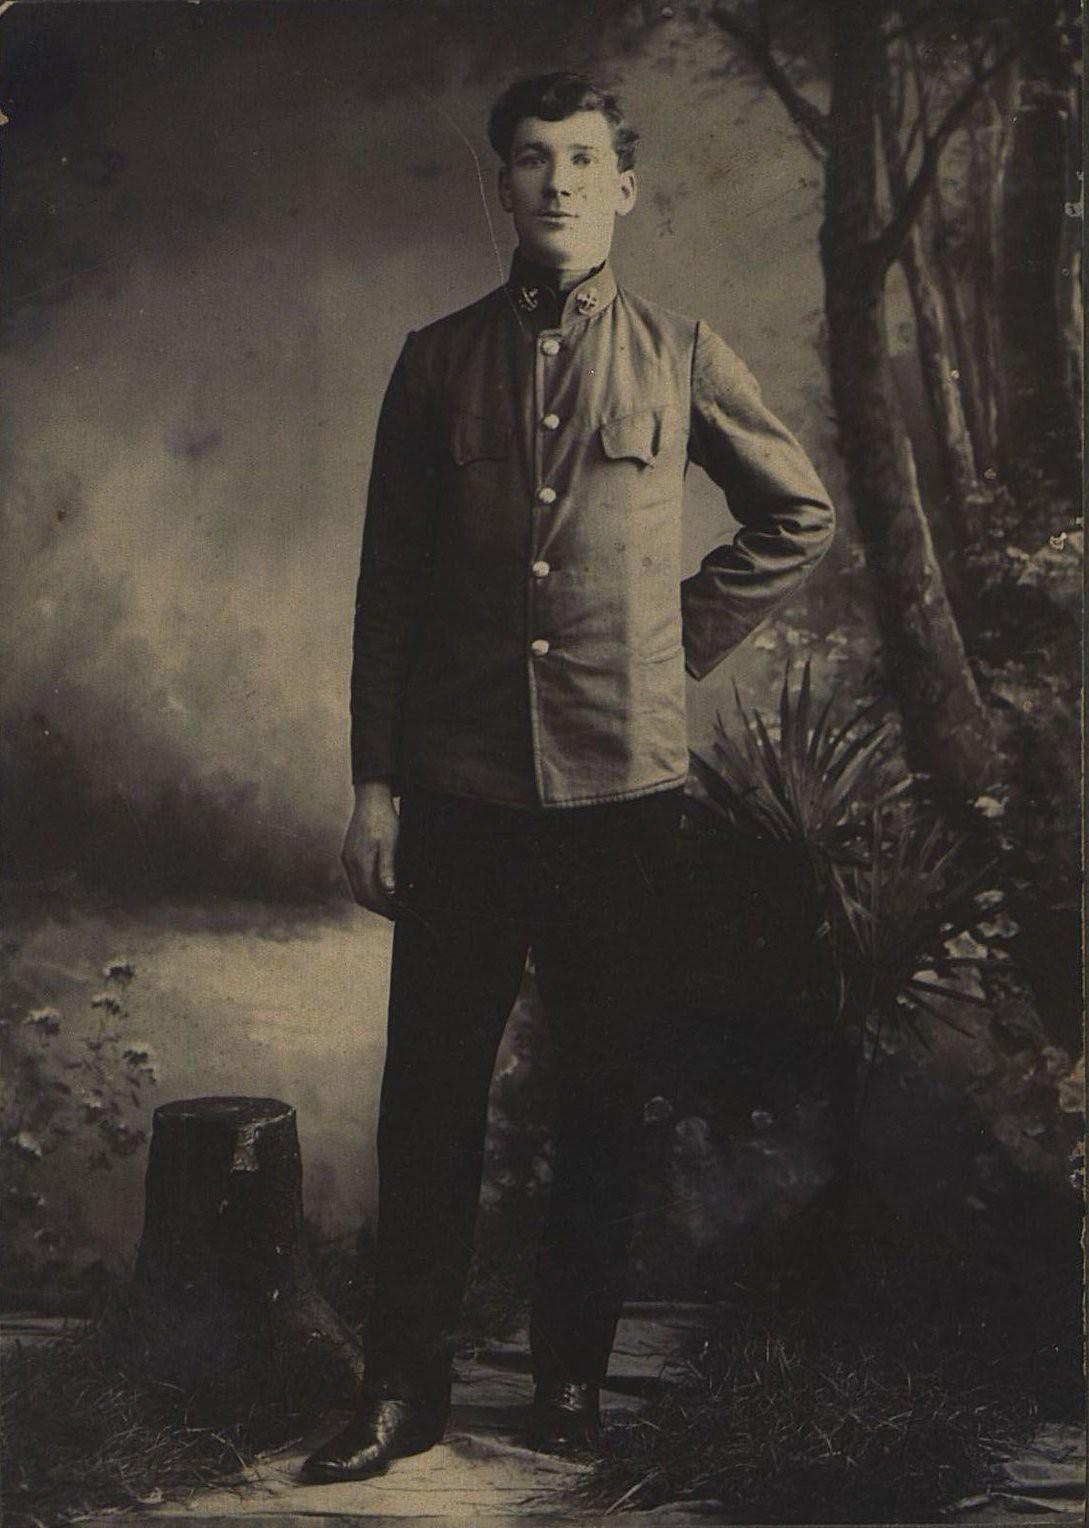 Пляшкевич Антон Фомич, помощник машиниста парохода «Меркурий» пароходства И.А. Опарина. 1913